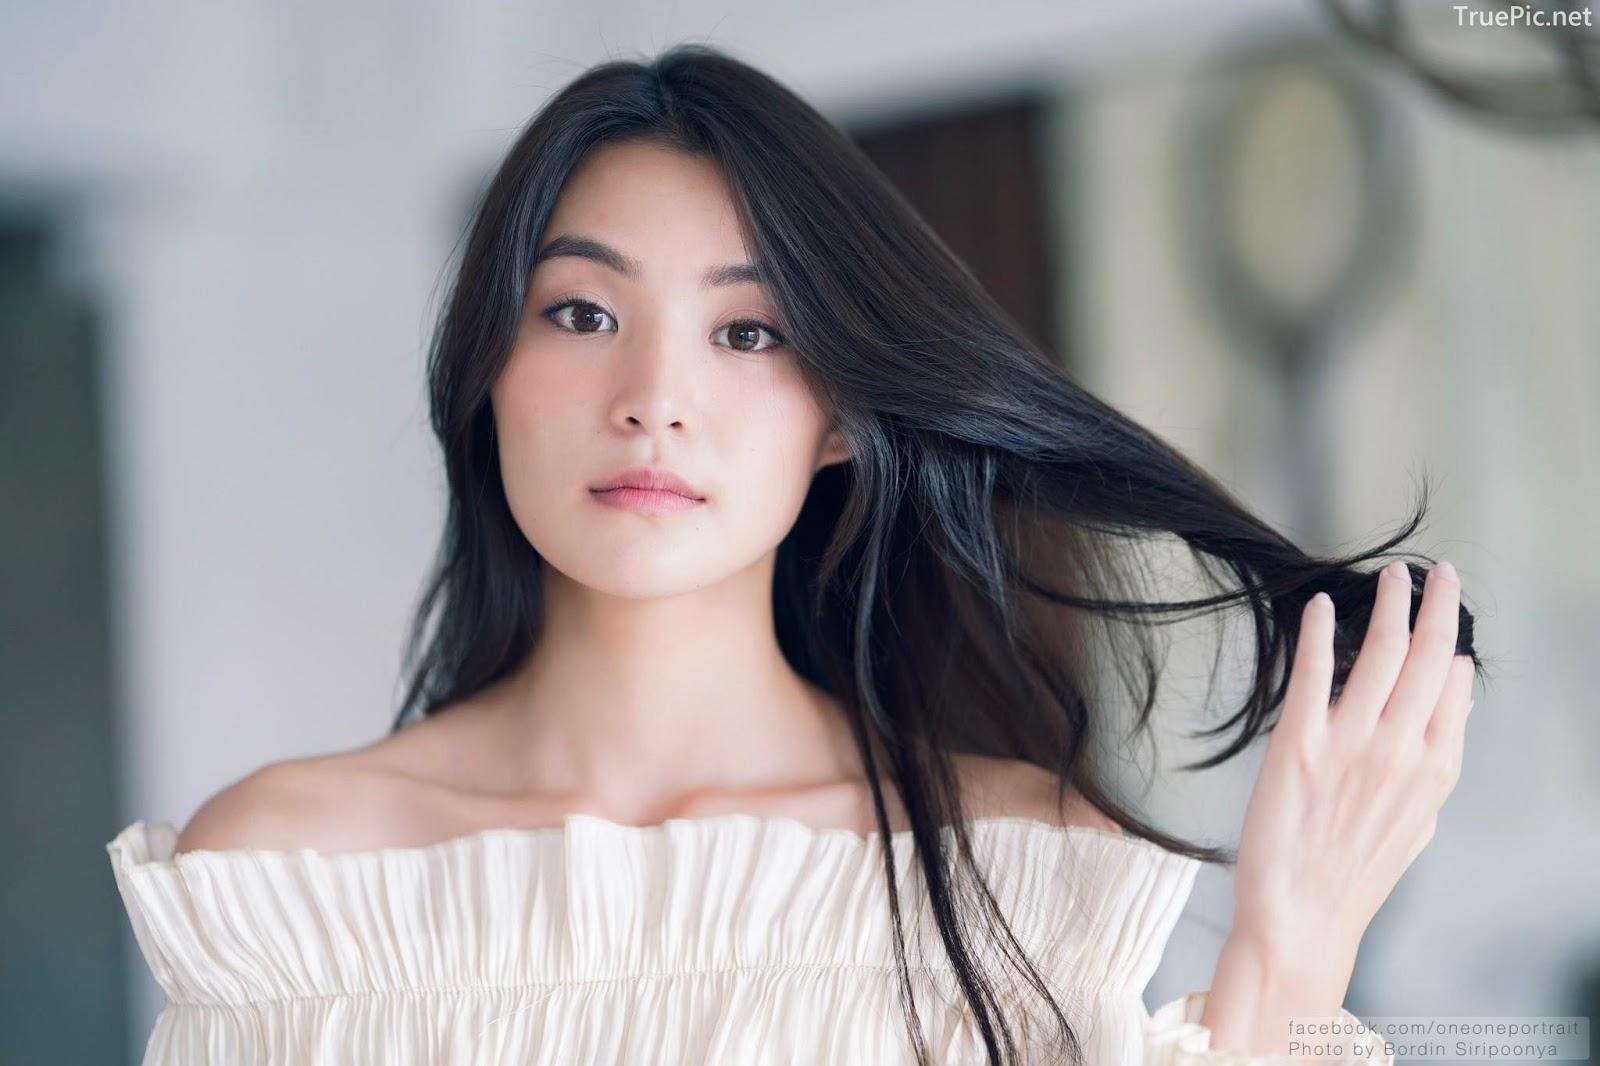 Beauty Thailand Kapook Phatchara vs Photo album Love you 3000 - Picture 2